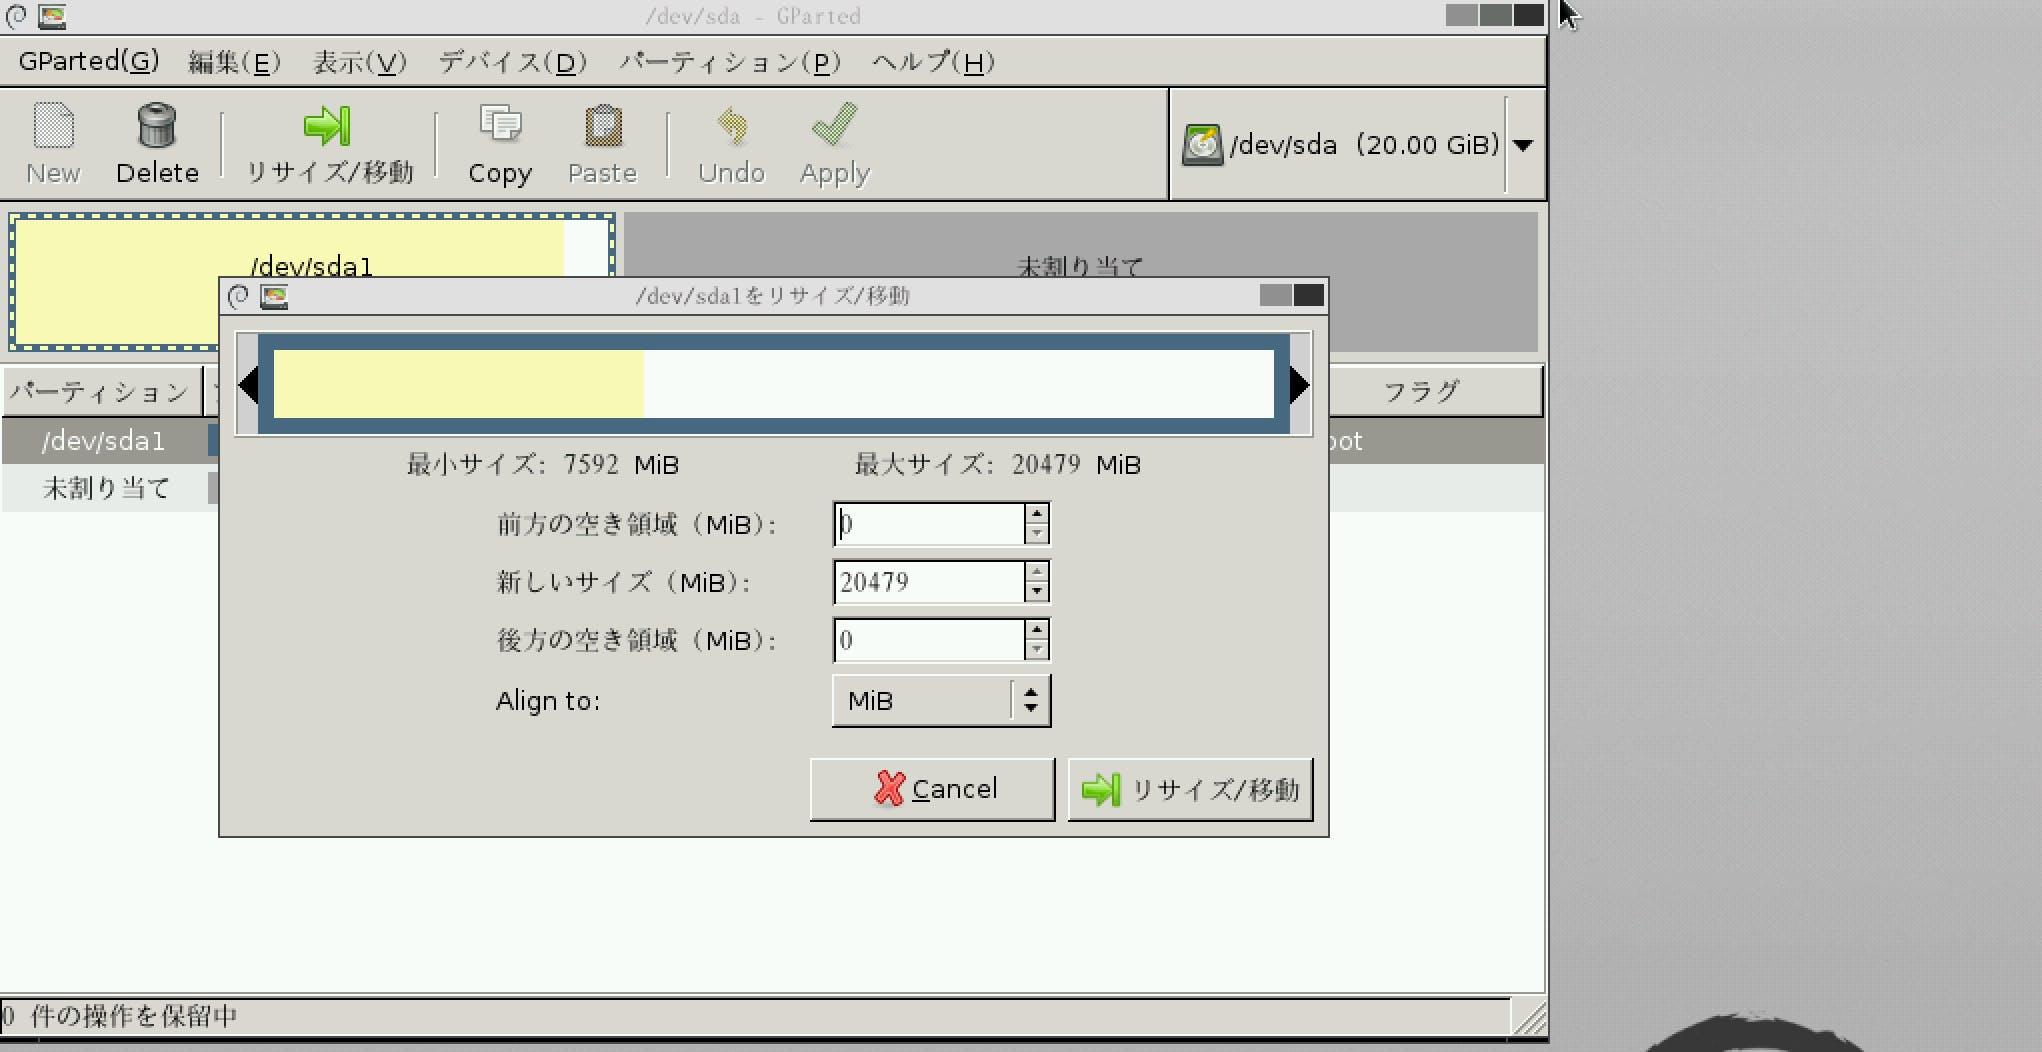 FC_default_1457173043946_65450__Running_.png